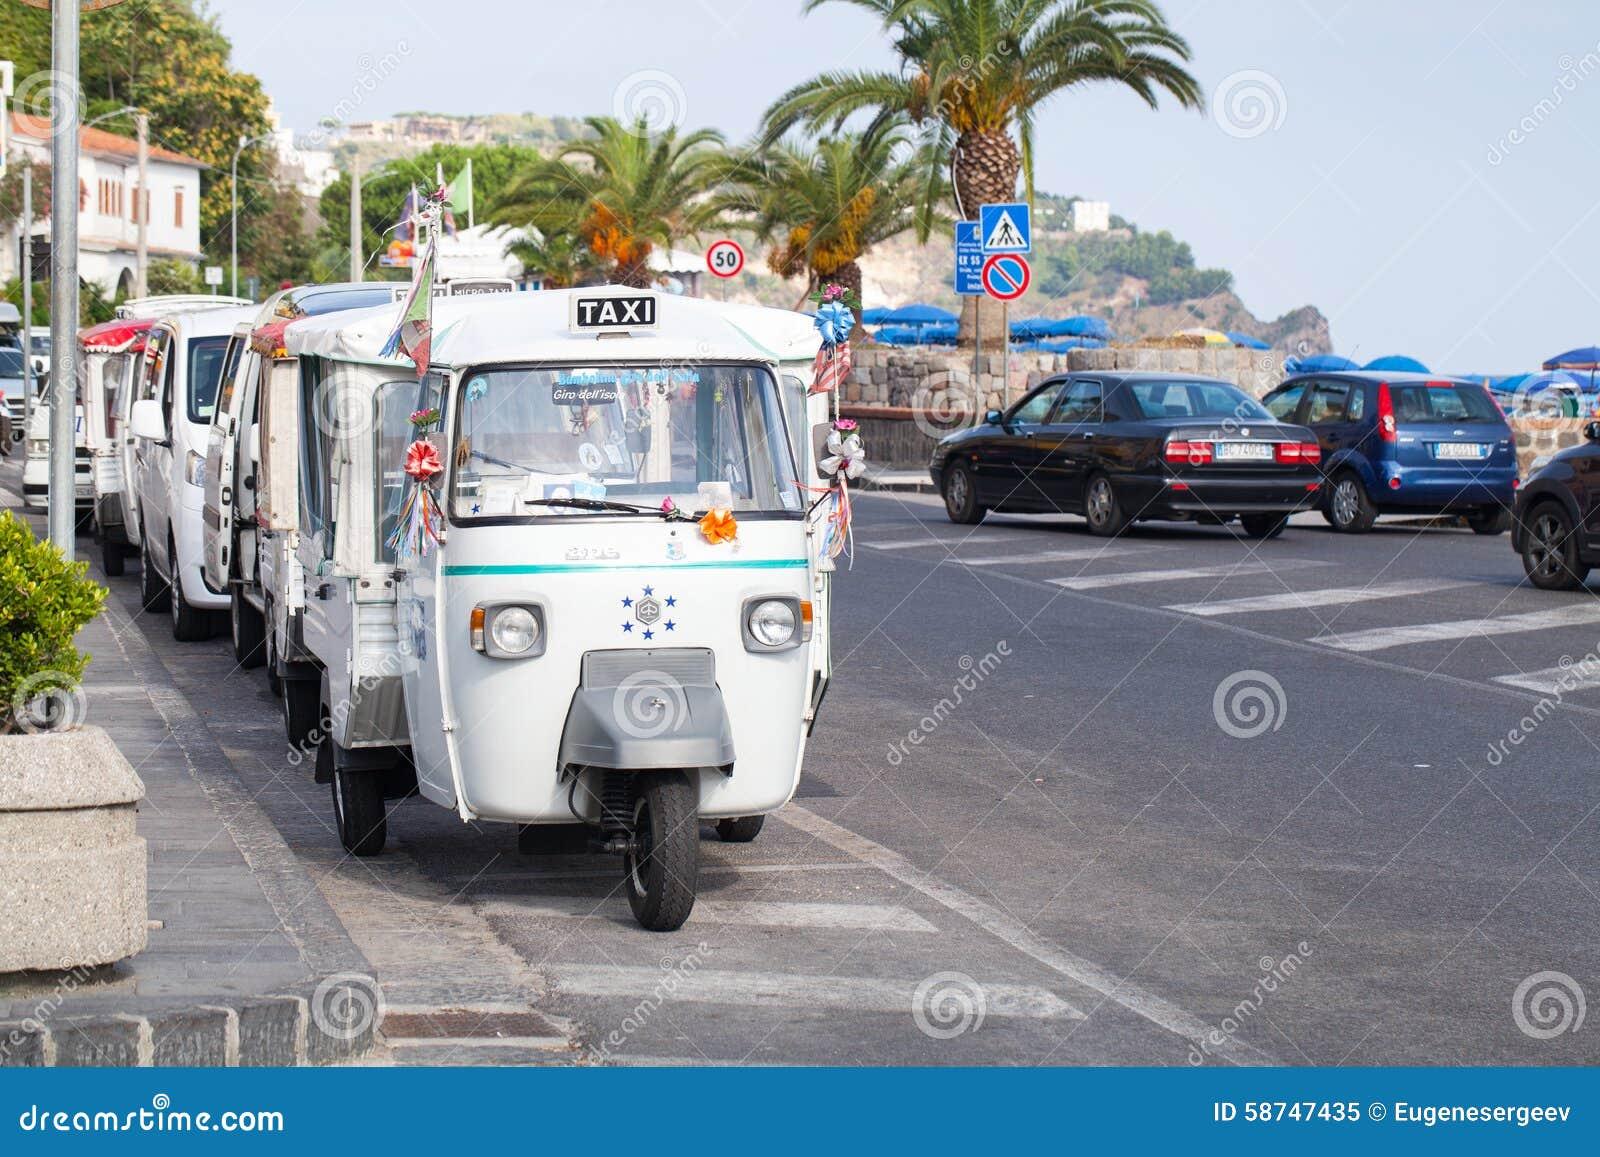 Casamicciola Terme Italy  city photos : Casamicciola Terme, Italy August 12, 2015: Micro taxi stand parked ...